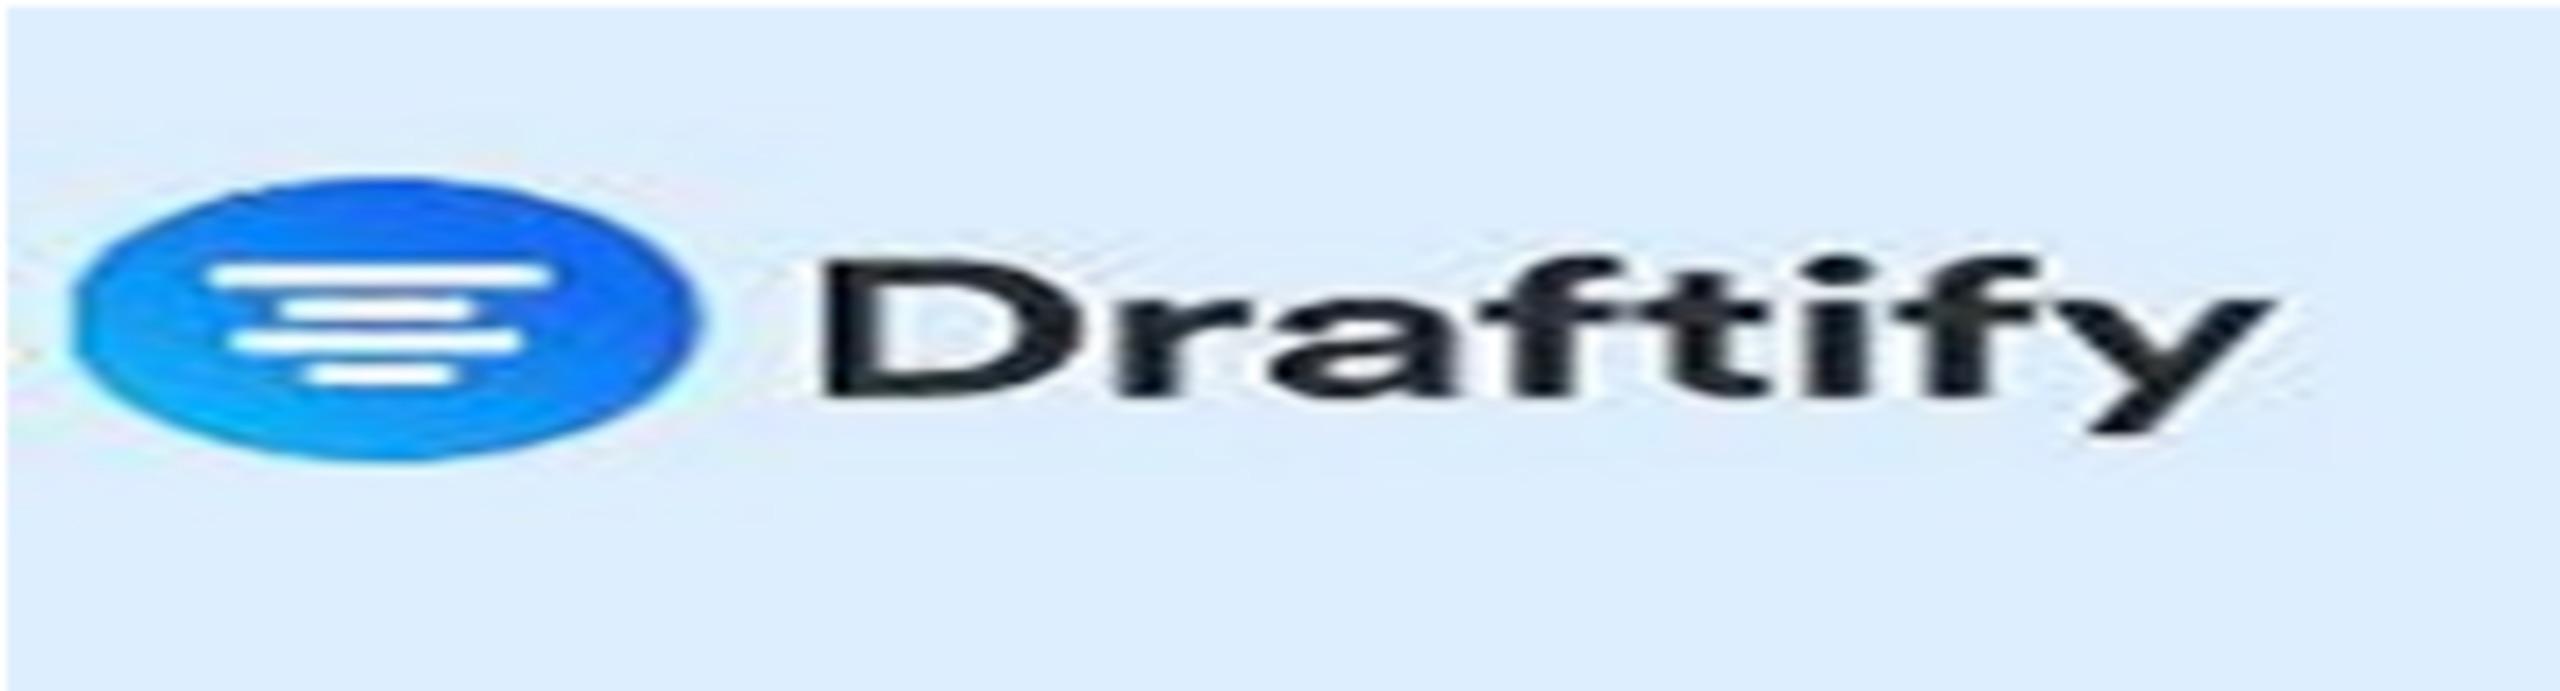 Draftify Essay (@draftifyessay) Cover Image